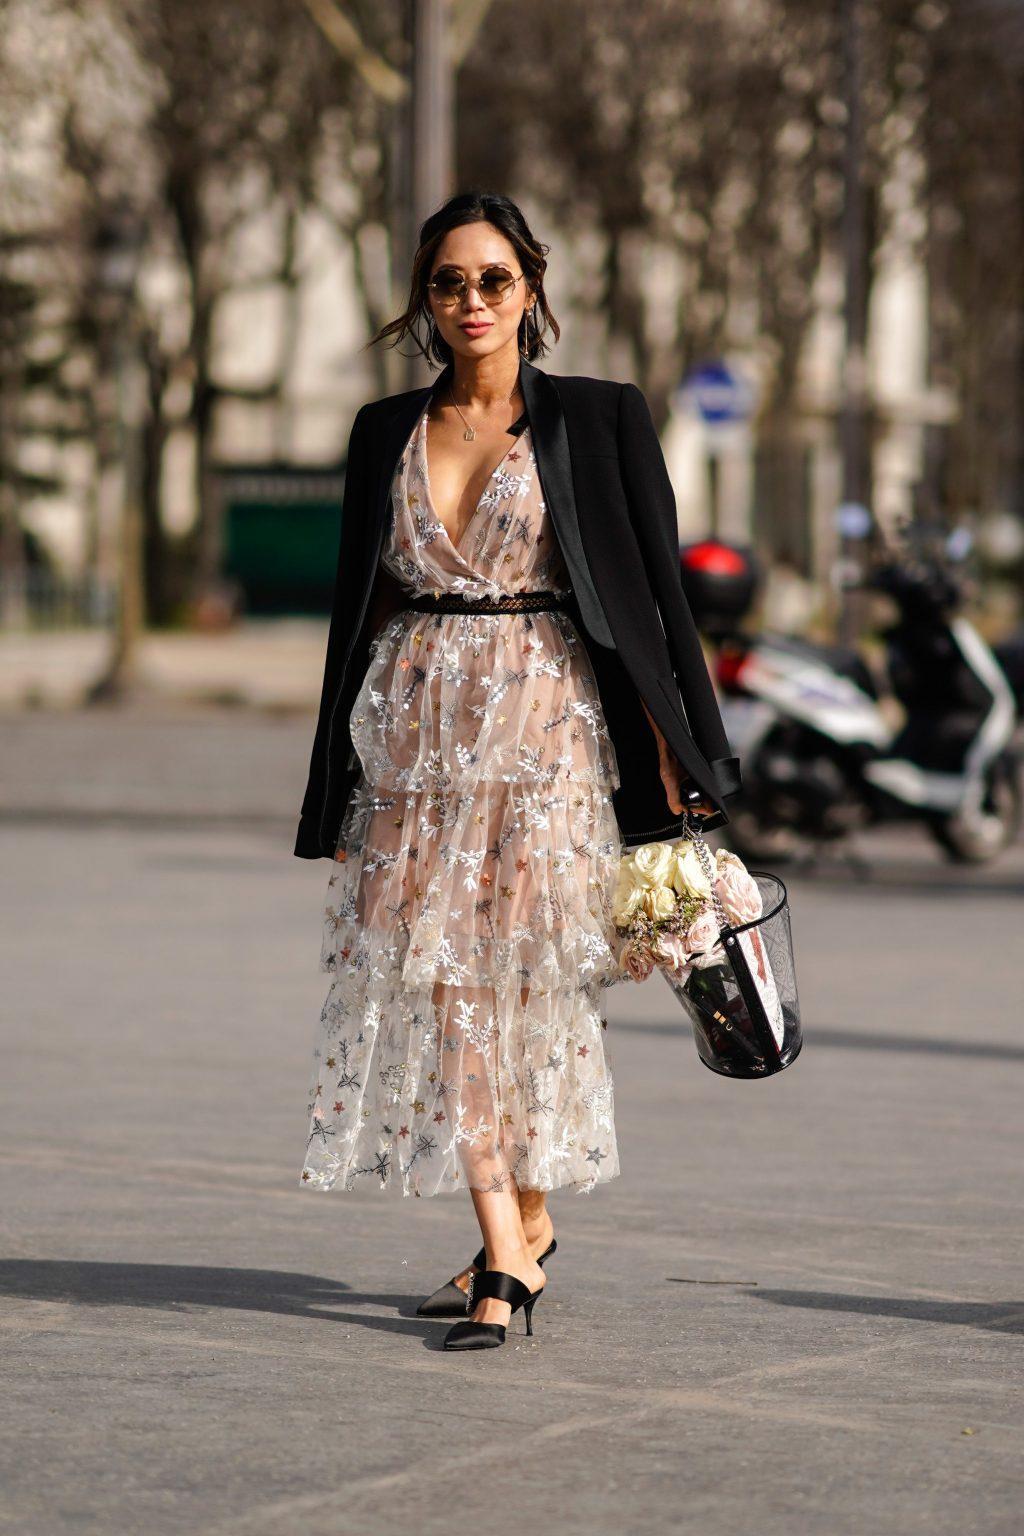 Aimee Song tham dự tuần lễ thời trang với blazer đen, đầm hoa